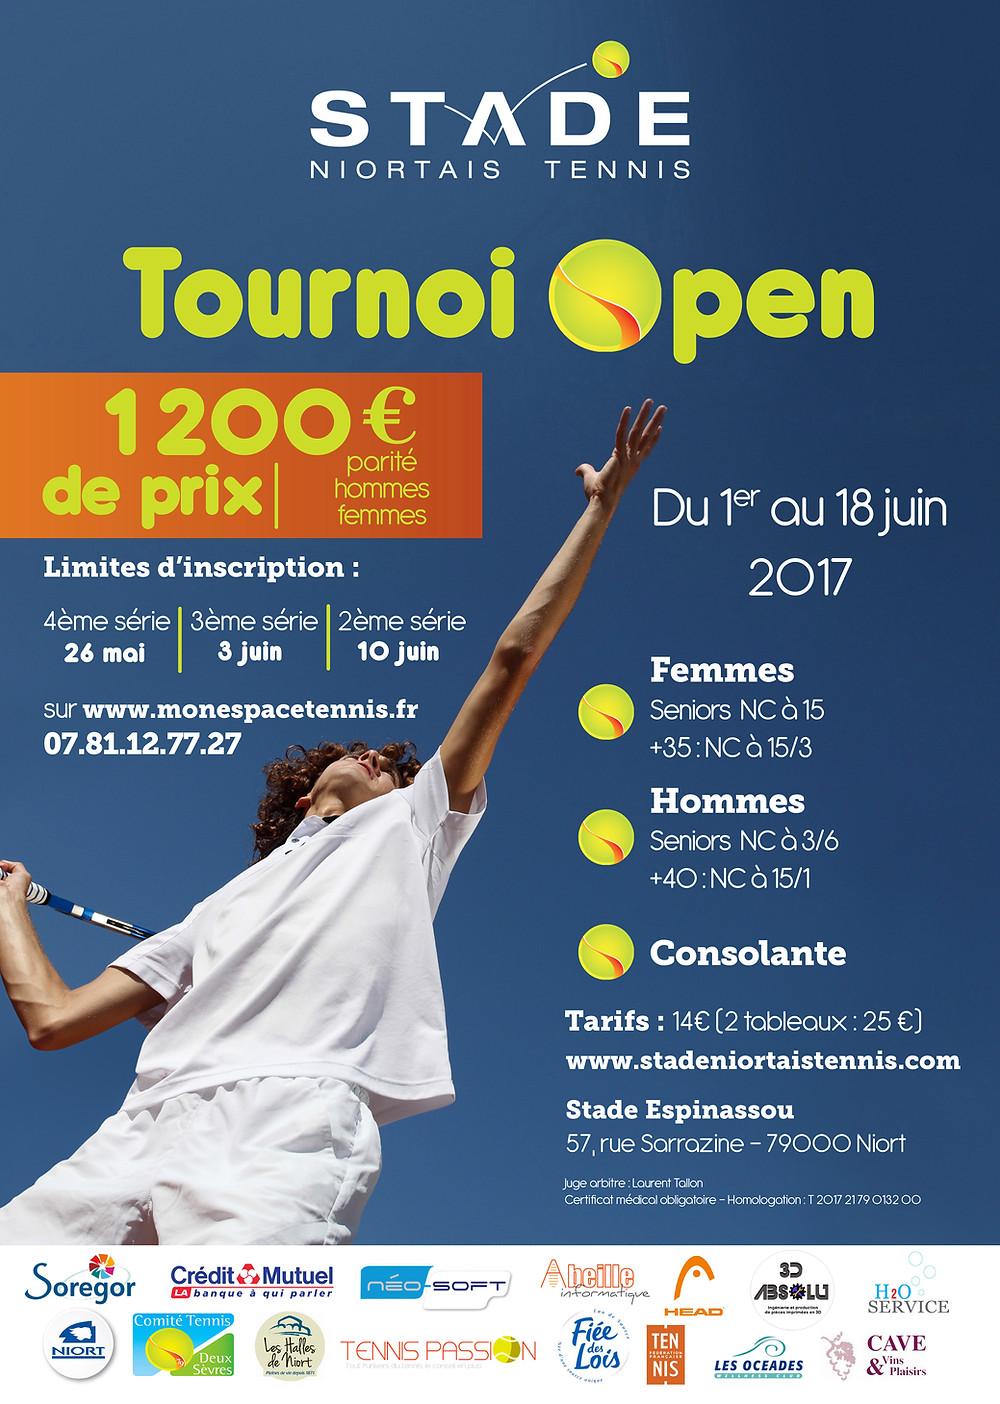 Affiche du tournoi Open 2017 du stade niortais tennis